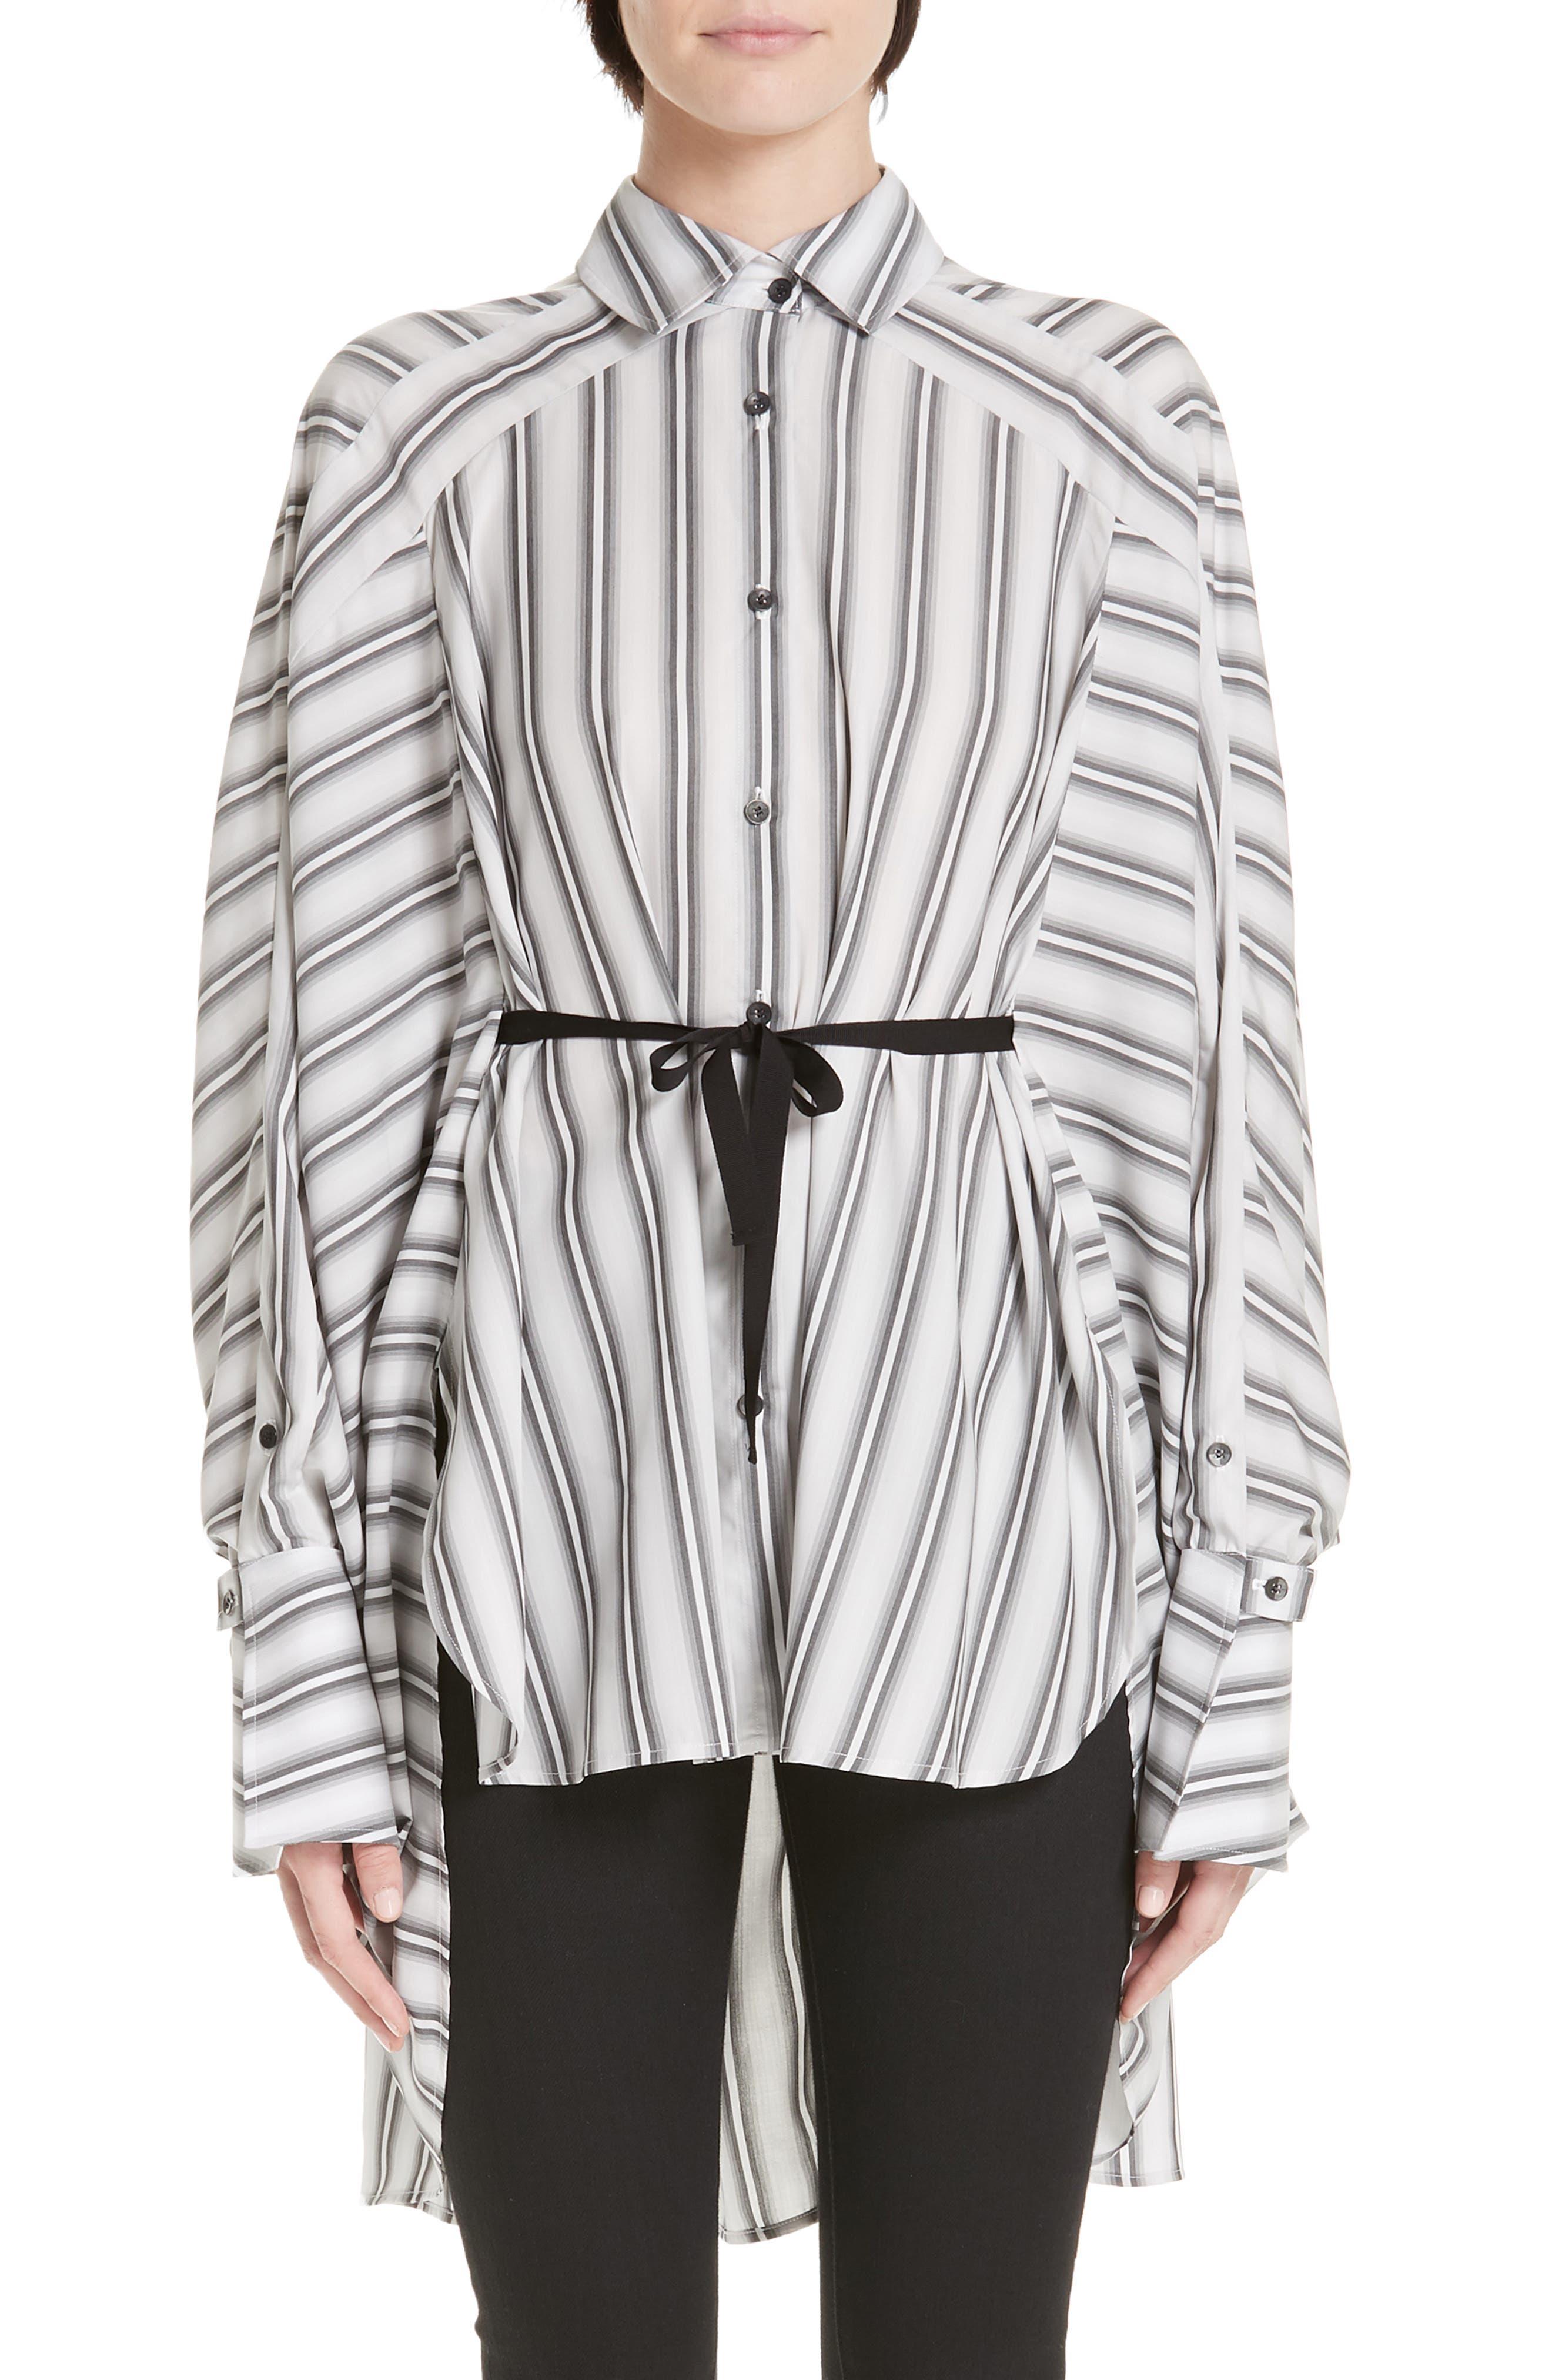 PALMER/HARDING, Streep Stripe Shirt, Main thumbnail 1, color, GRADIENT STRIPE WITH BLACK